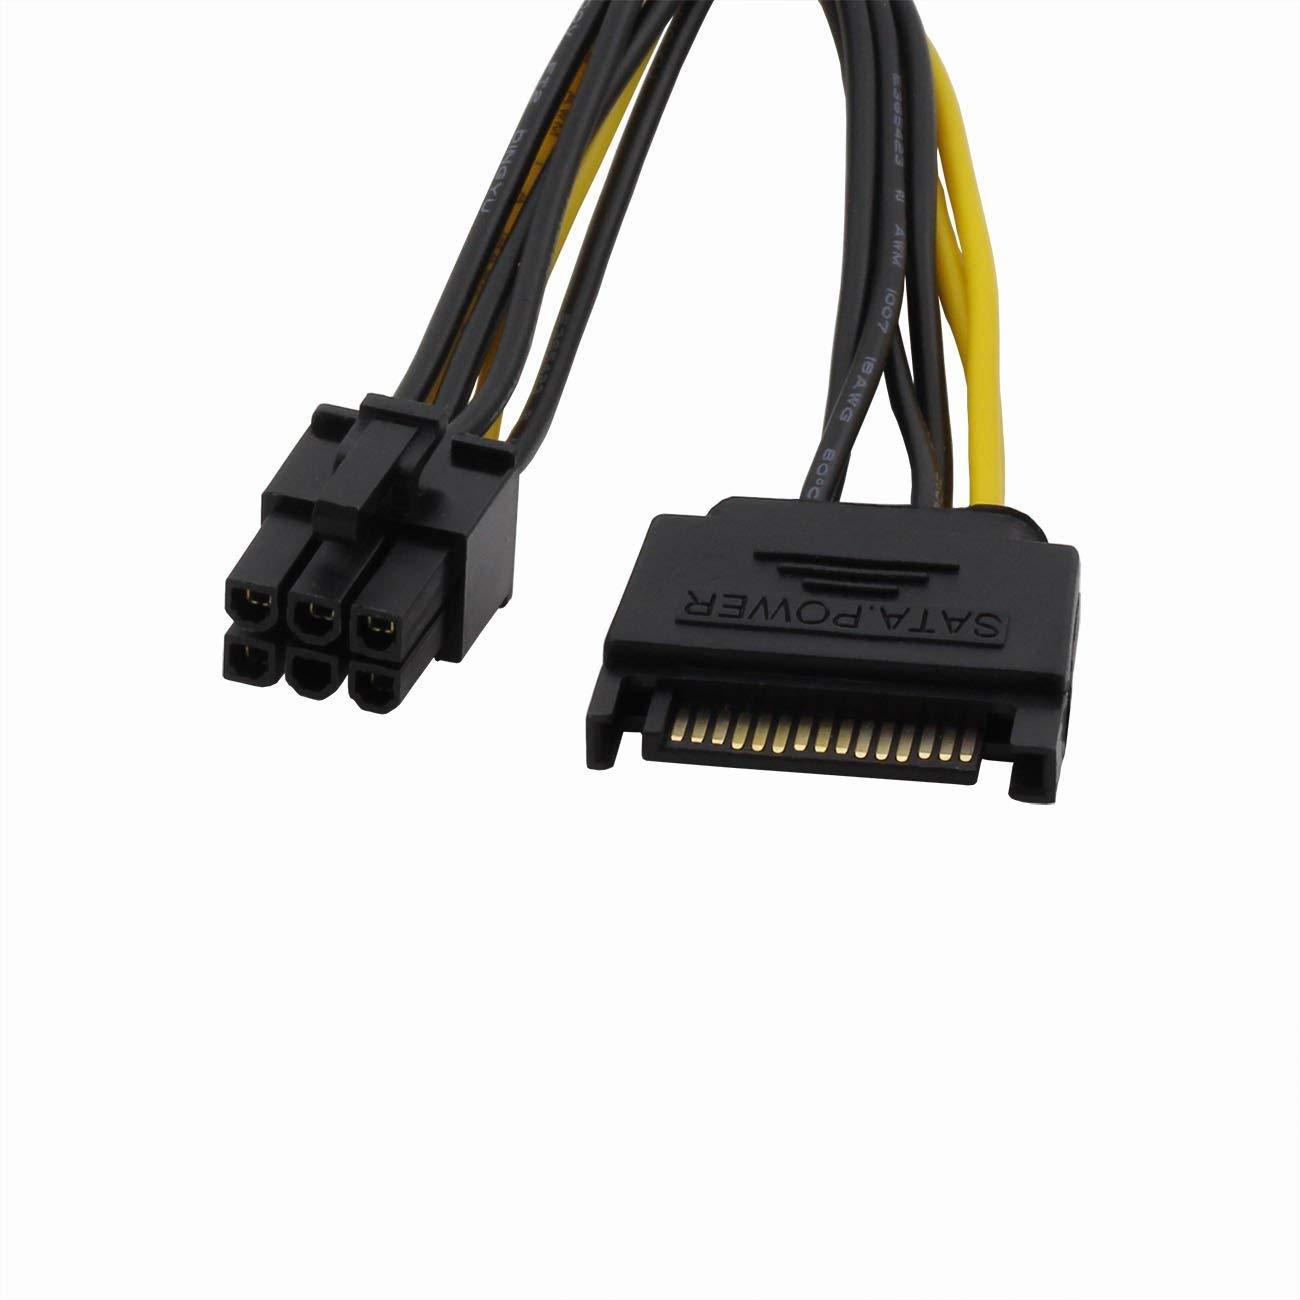 ZRM&E 2PCS SATA Power Adapter Line 15 Pin Male To 6 Pin PCI Express Female PCI-E Sata Graphics Converter Adapter Video Card Power Cable 20cm